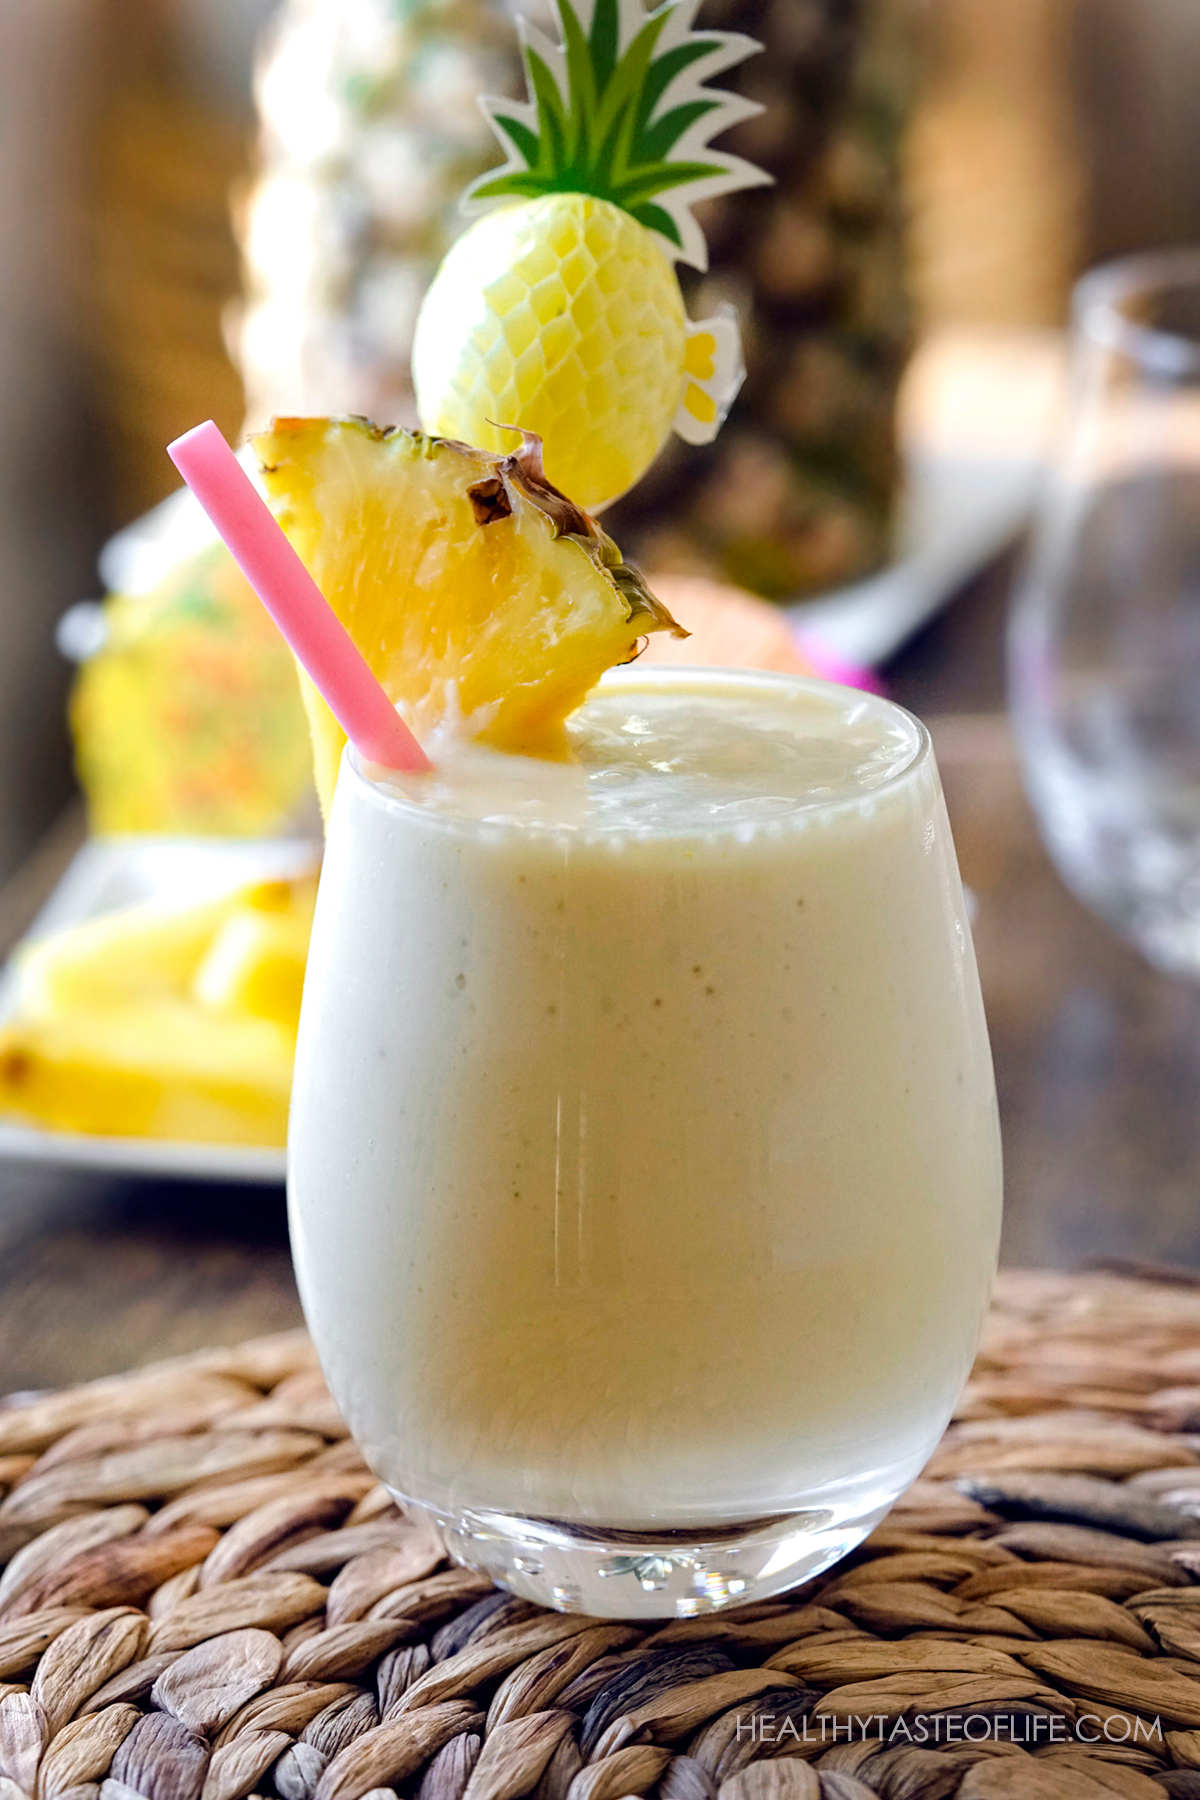 Healthy Dairy Free Pineapple Milk Shake.